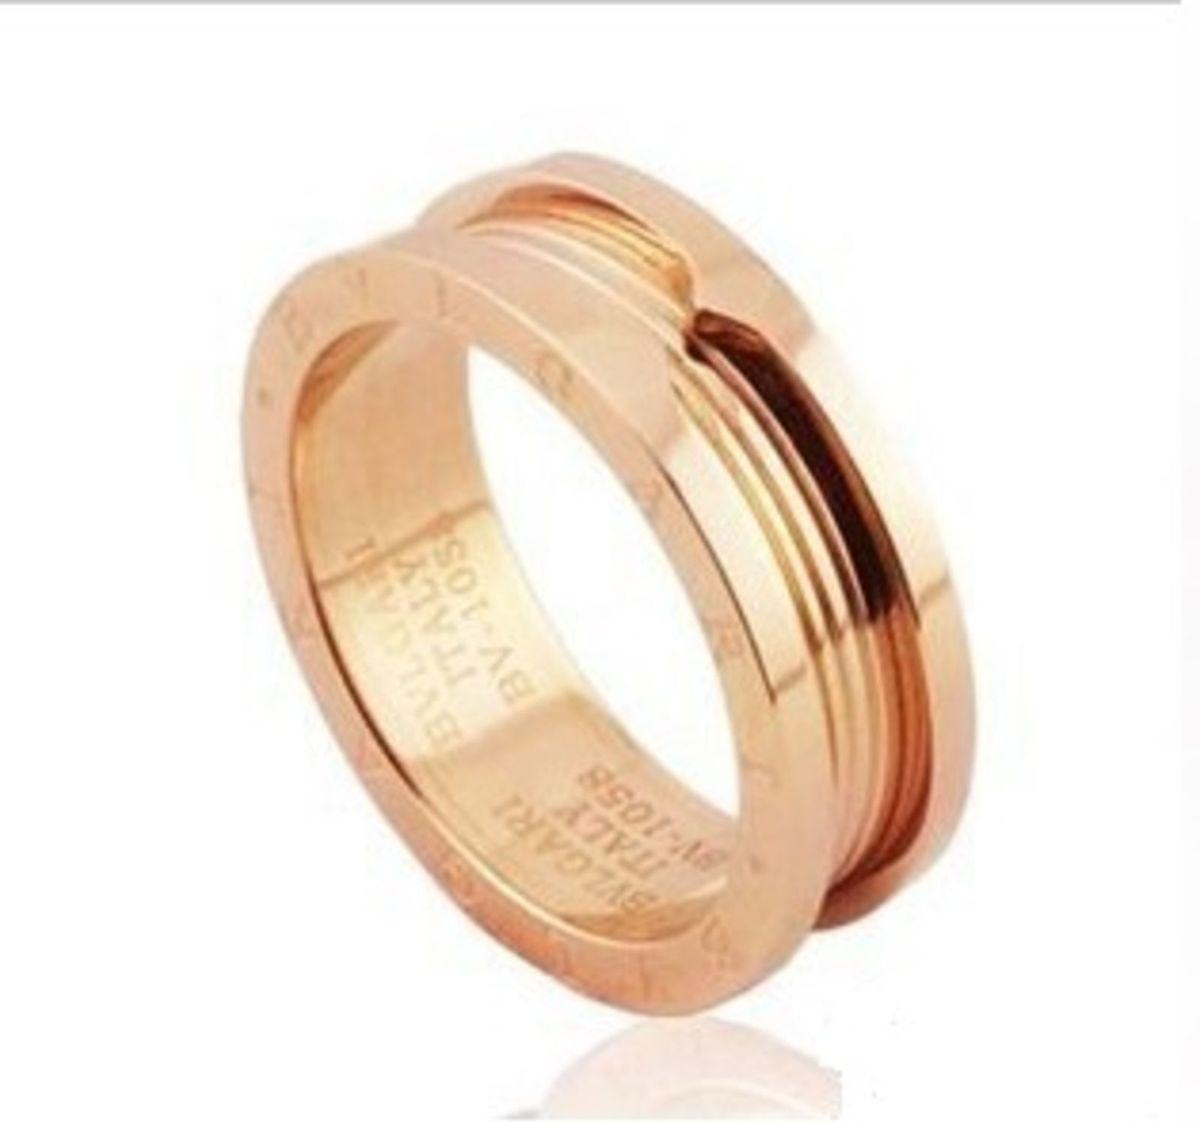 d883b38e73a anel modelo bzero bvlgari fino - bijoux mcferraro.  Czm6ly9wag90b3muzw5qb2vplmnvbs5ici9wcm9kdwn0cy80nzu0ntkvzweyzdg3y2rmmwuxntzmmdjimtu3ogningflyzbmntquanbn  ...